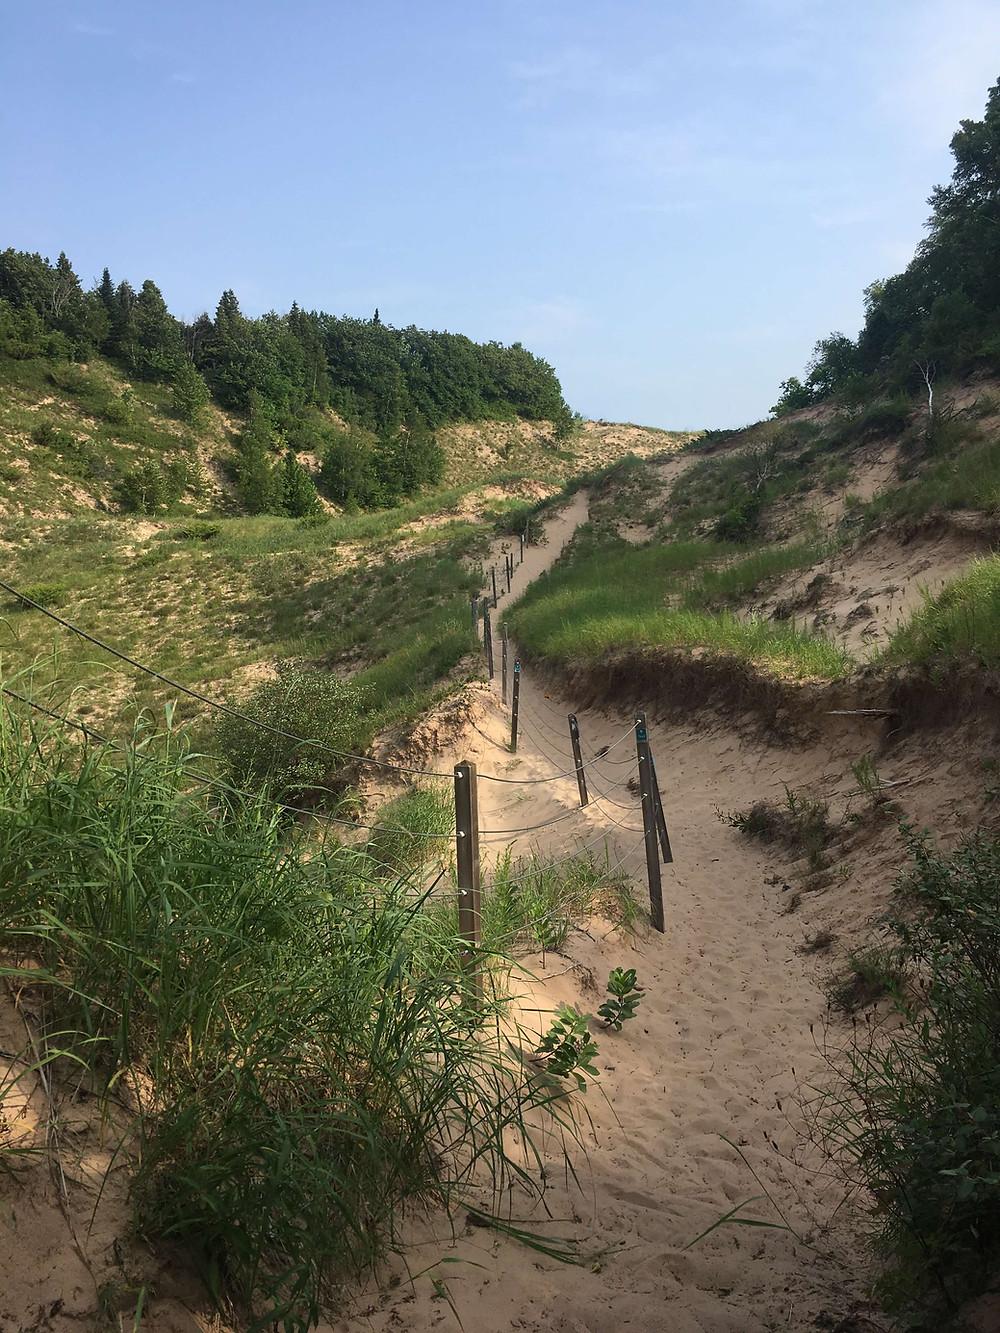 Arcadia Dune Baldy Trail